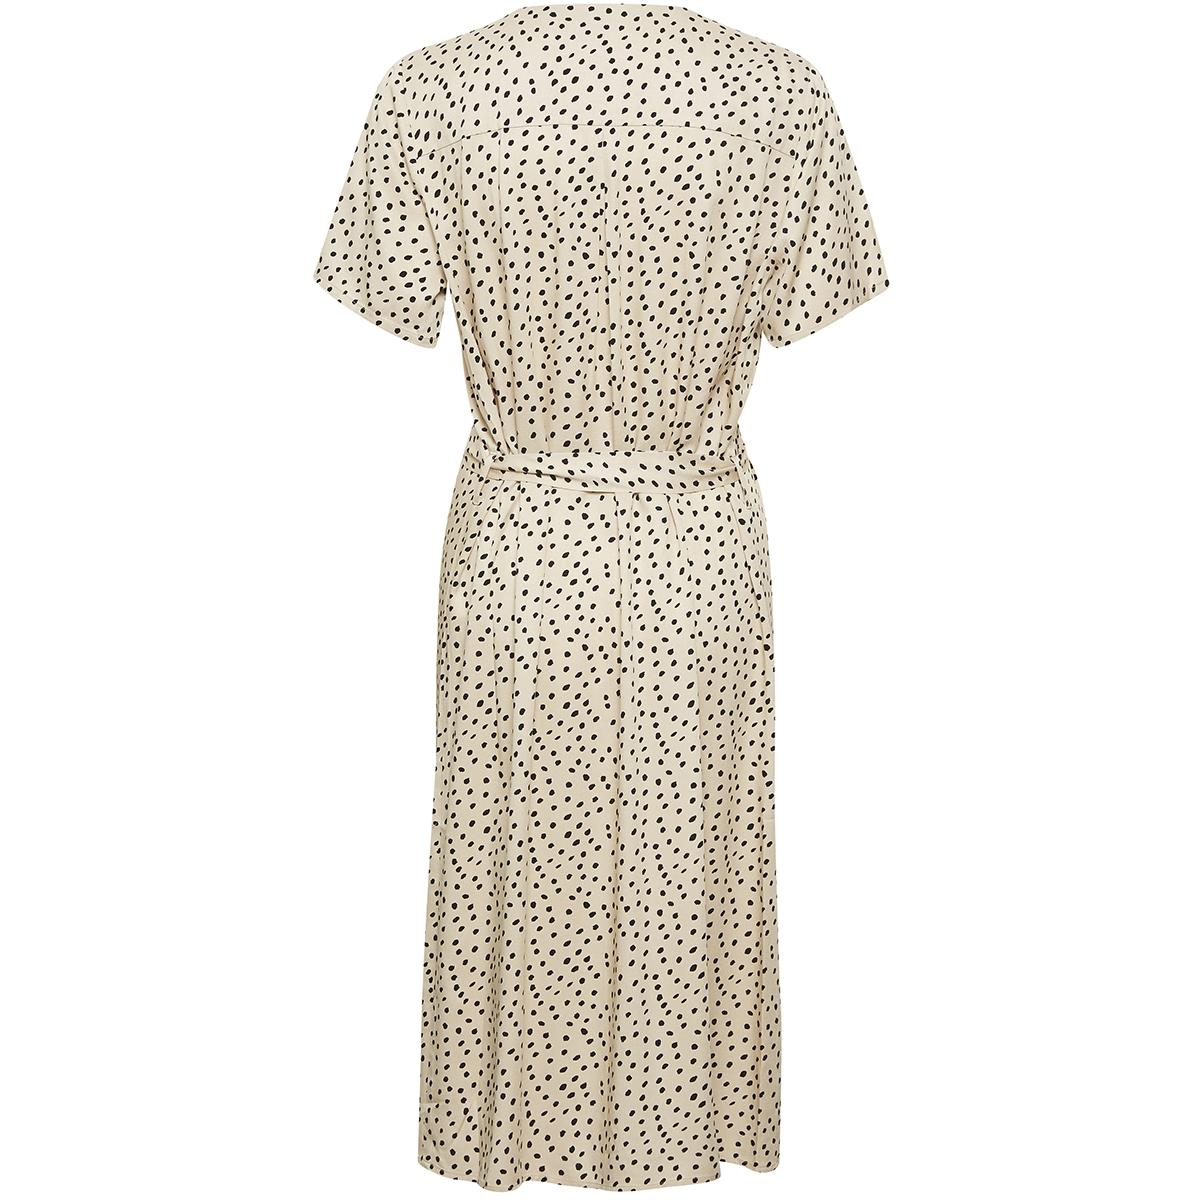 dreasz dot woven dress 30510121 saint tropez jurk 151308